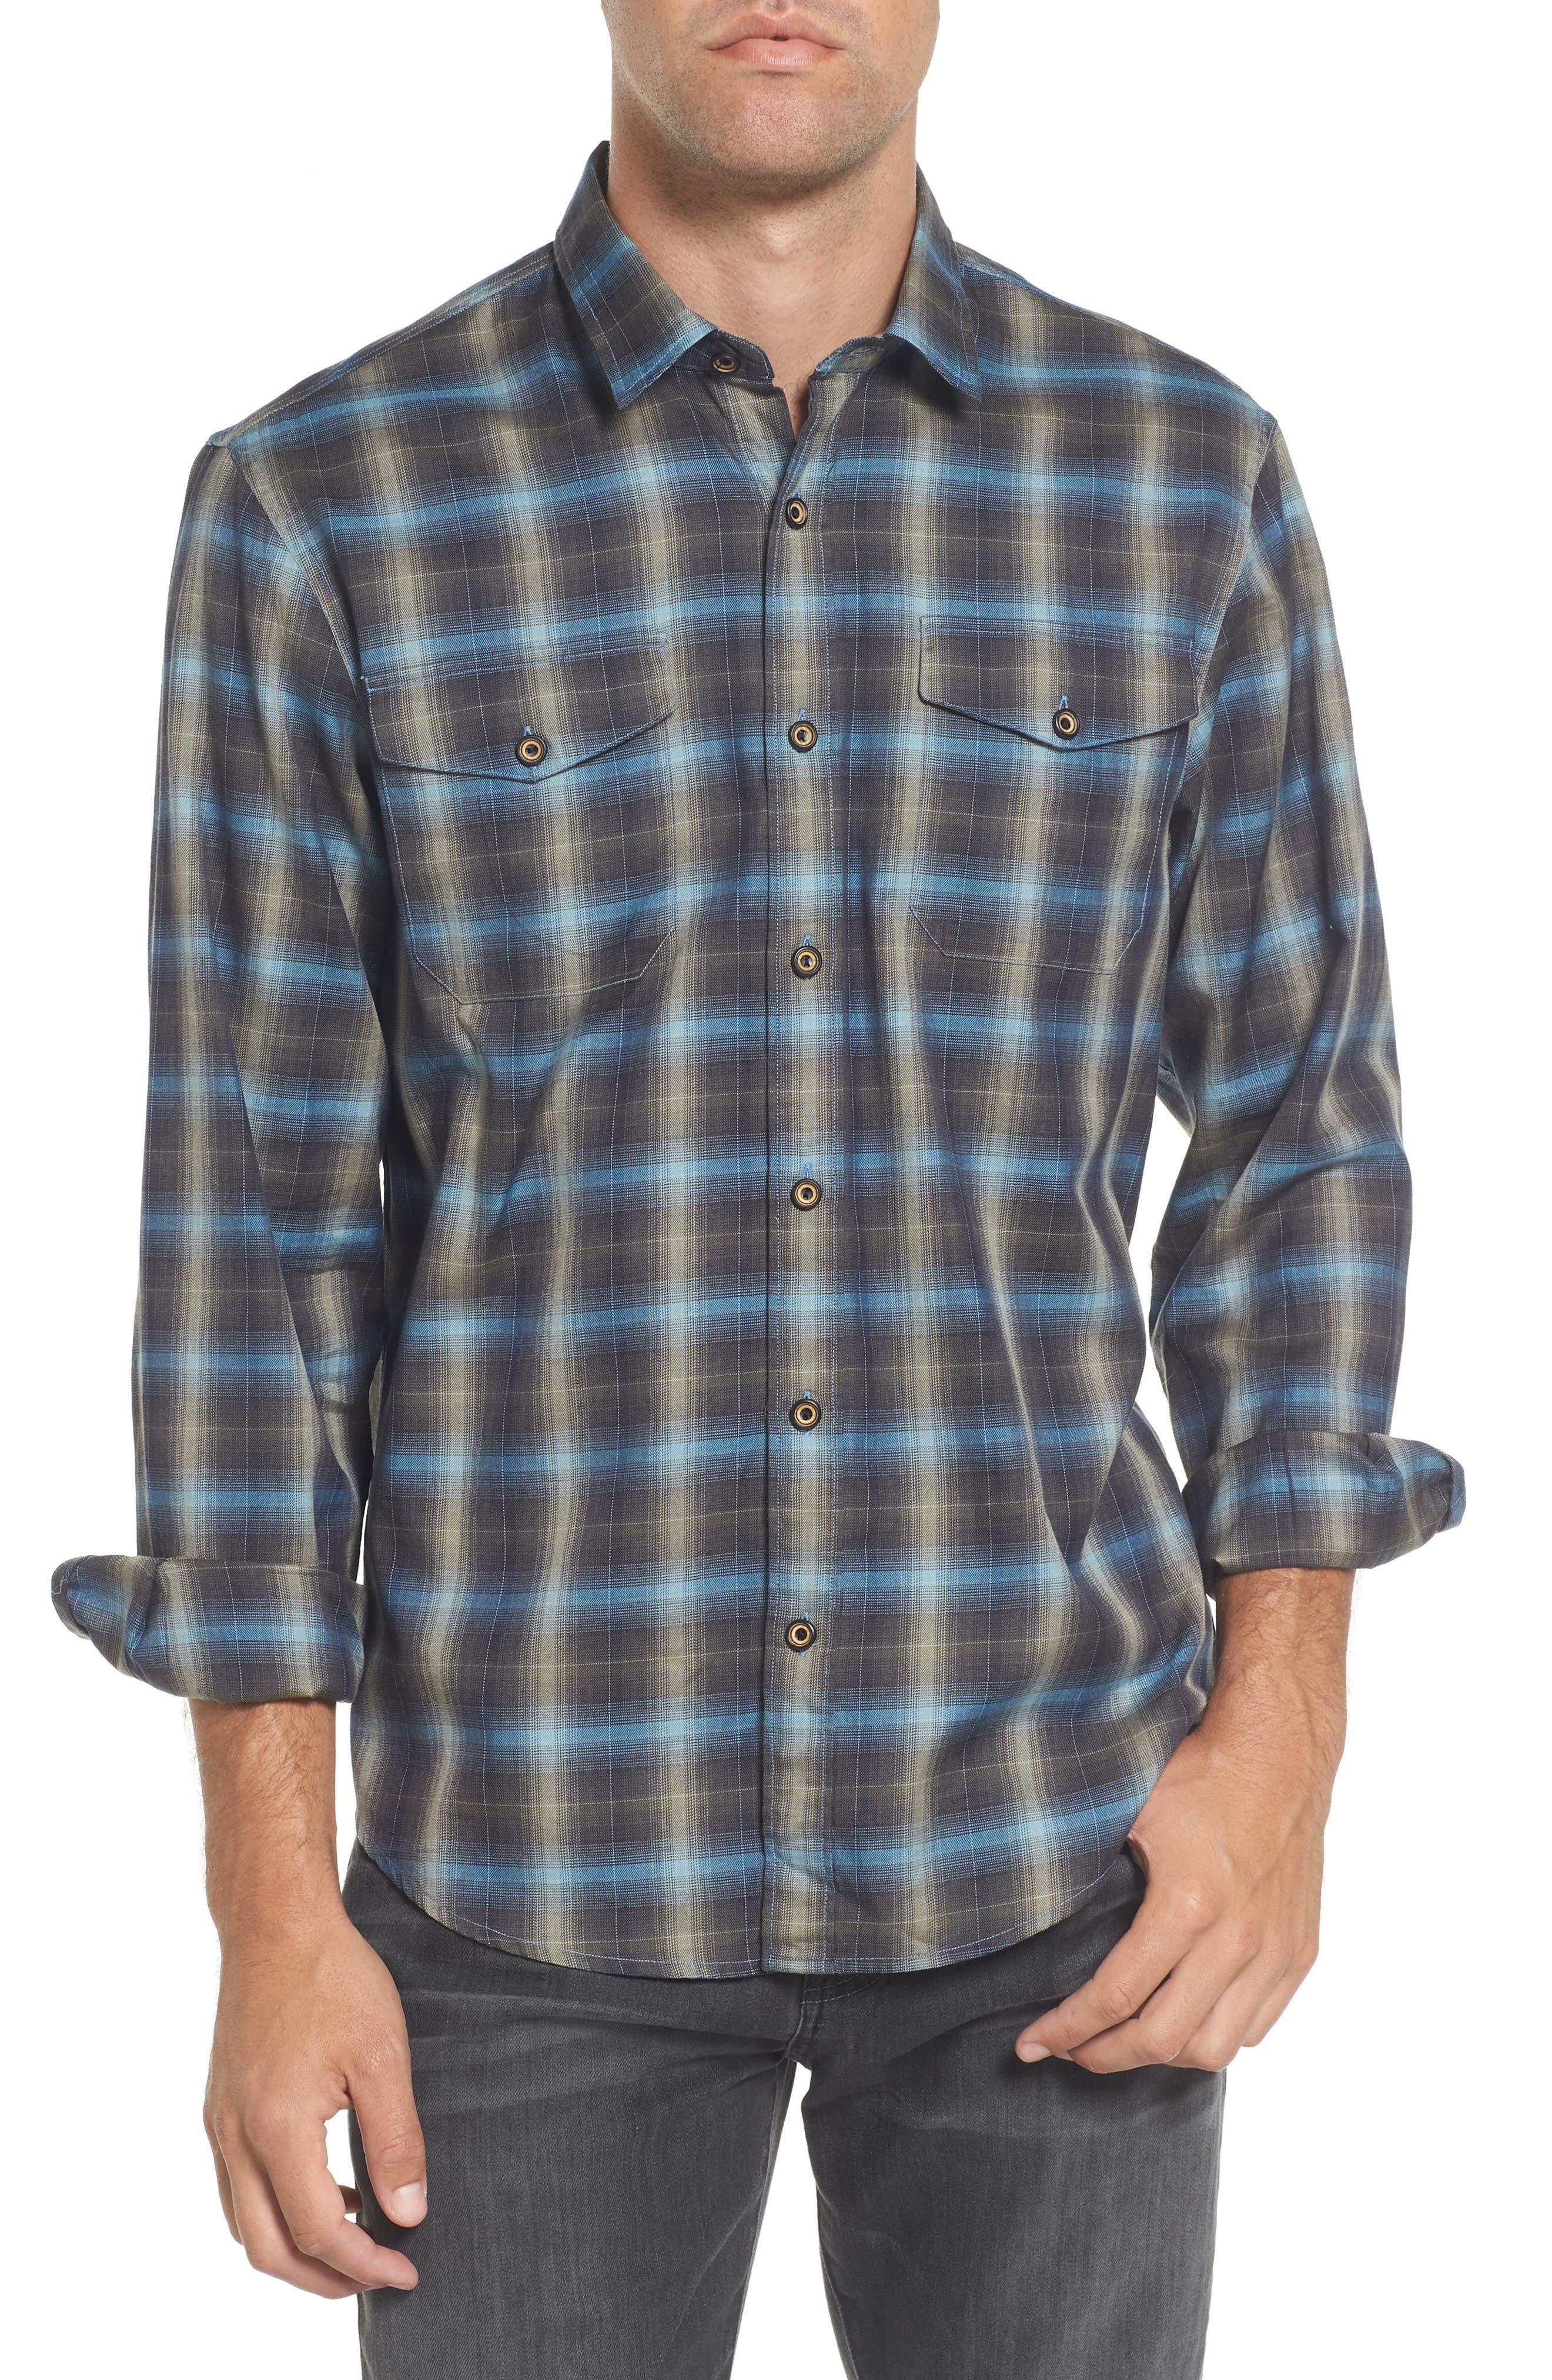 Main Image - Coastaoro Walnut Plaid Garment Washed Flannel Shirt